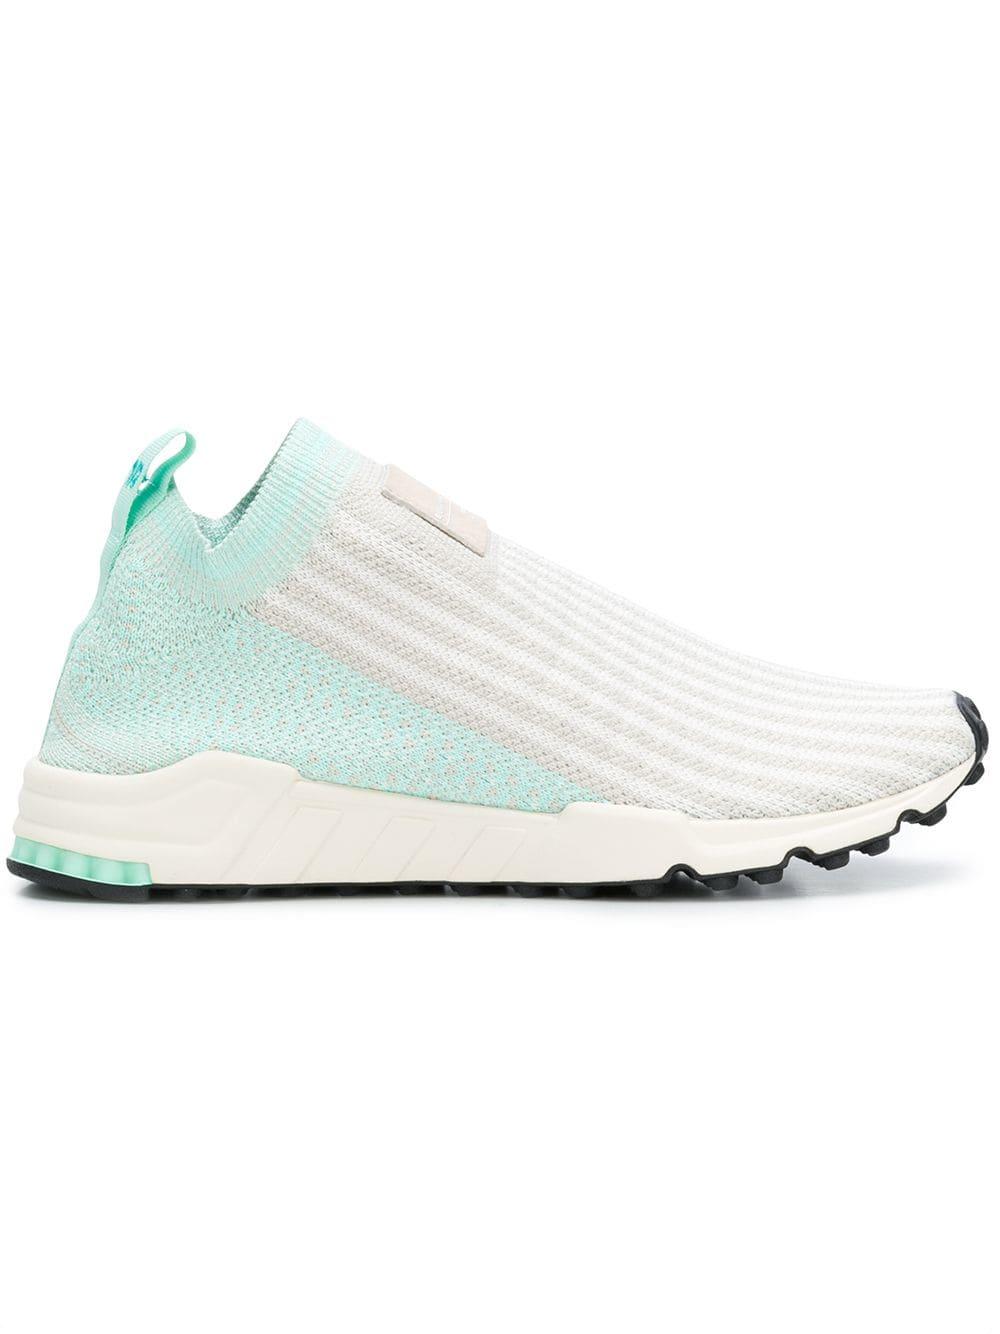 Adidas EQT Support Sock Primeknit Sneakers | Support socks